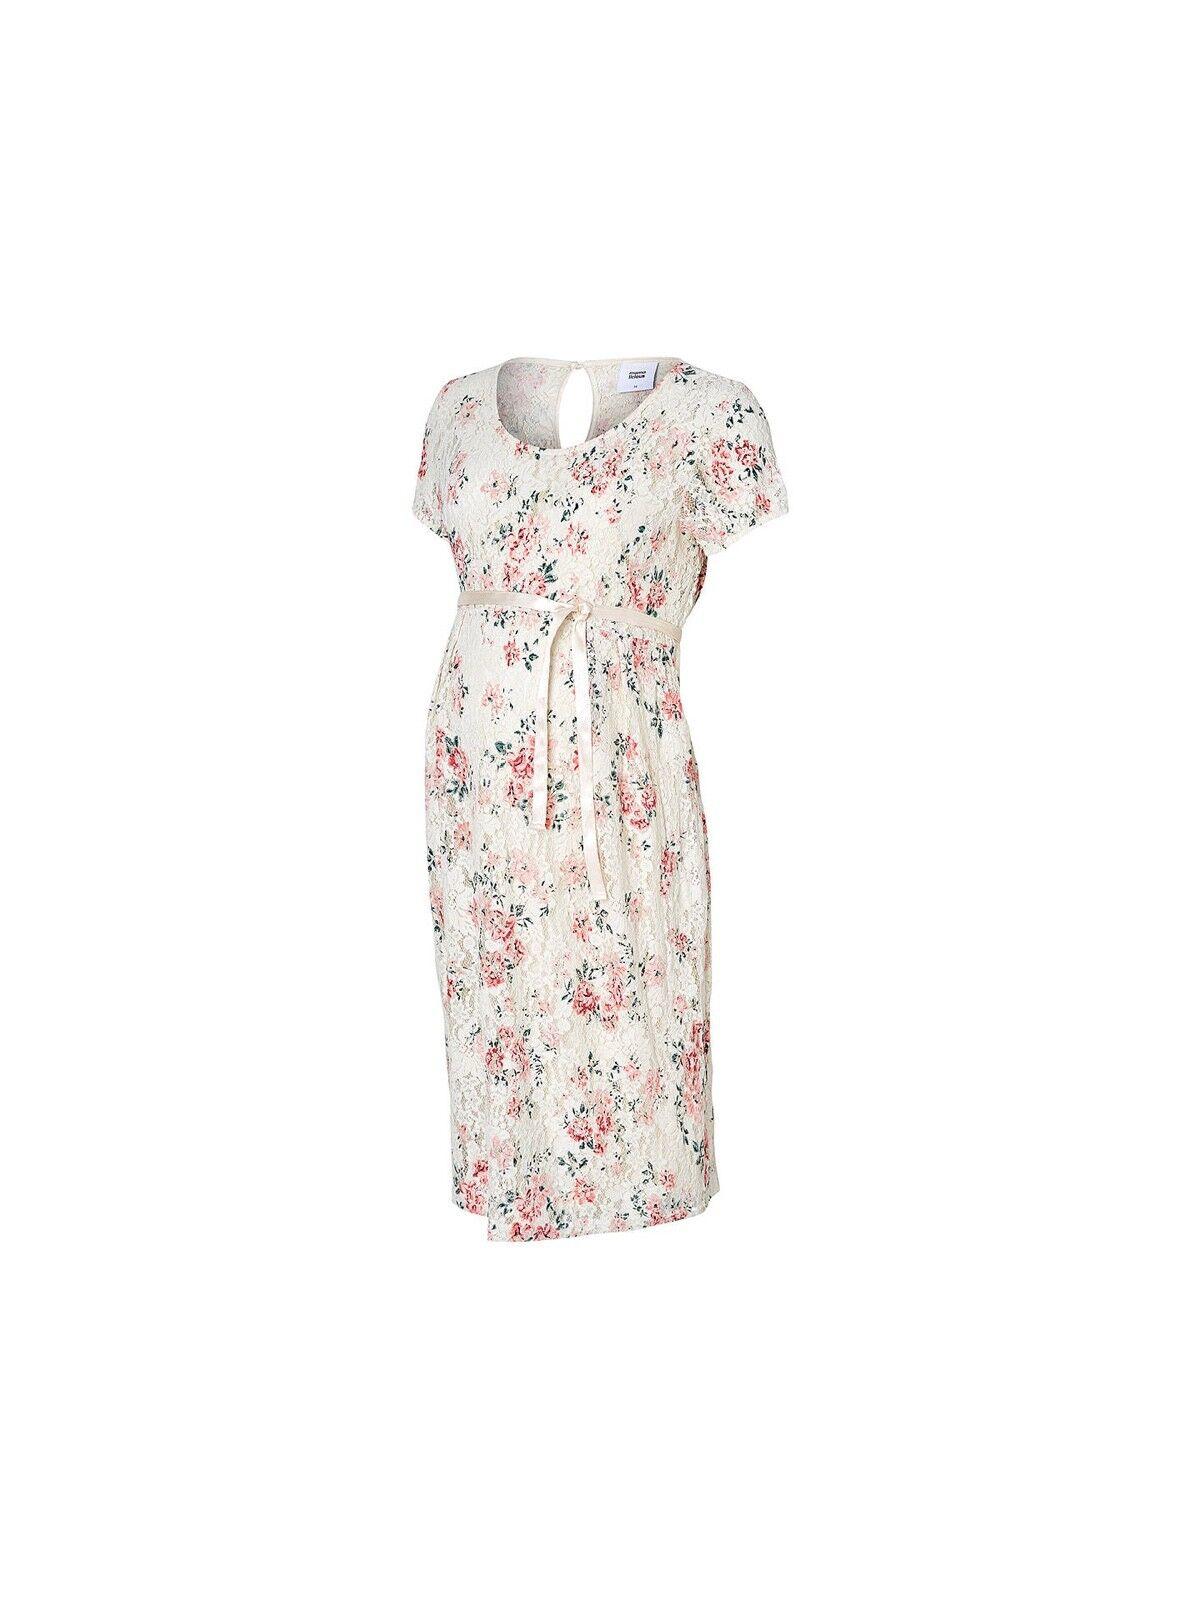 Mamalicious Adalina Short Sleeve Lace Maternity Dress Floral LARGE